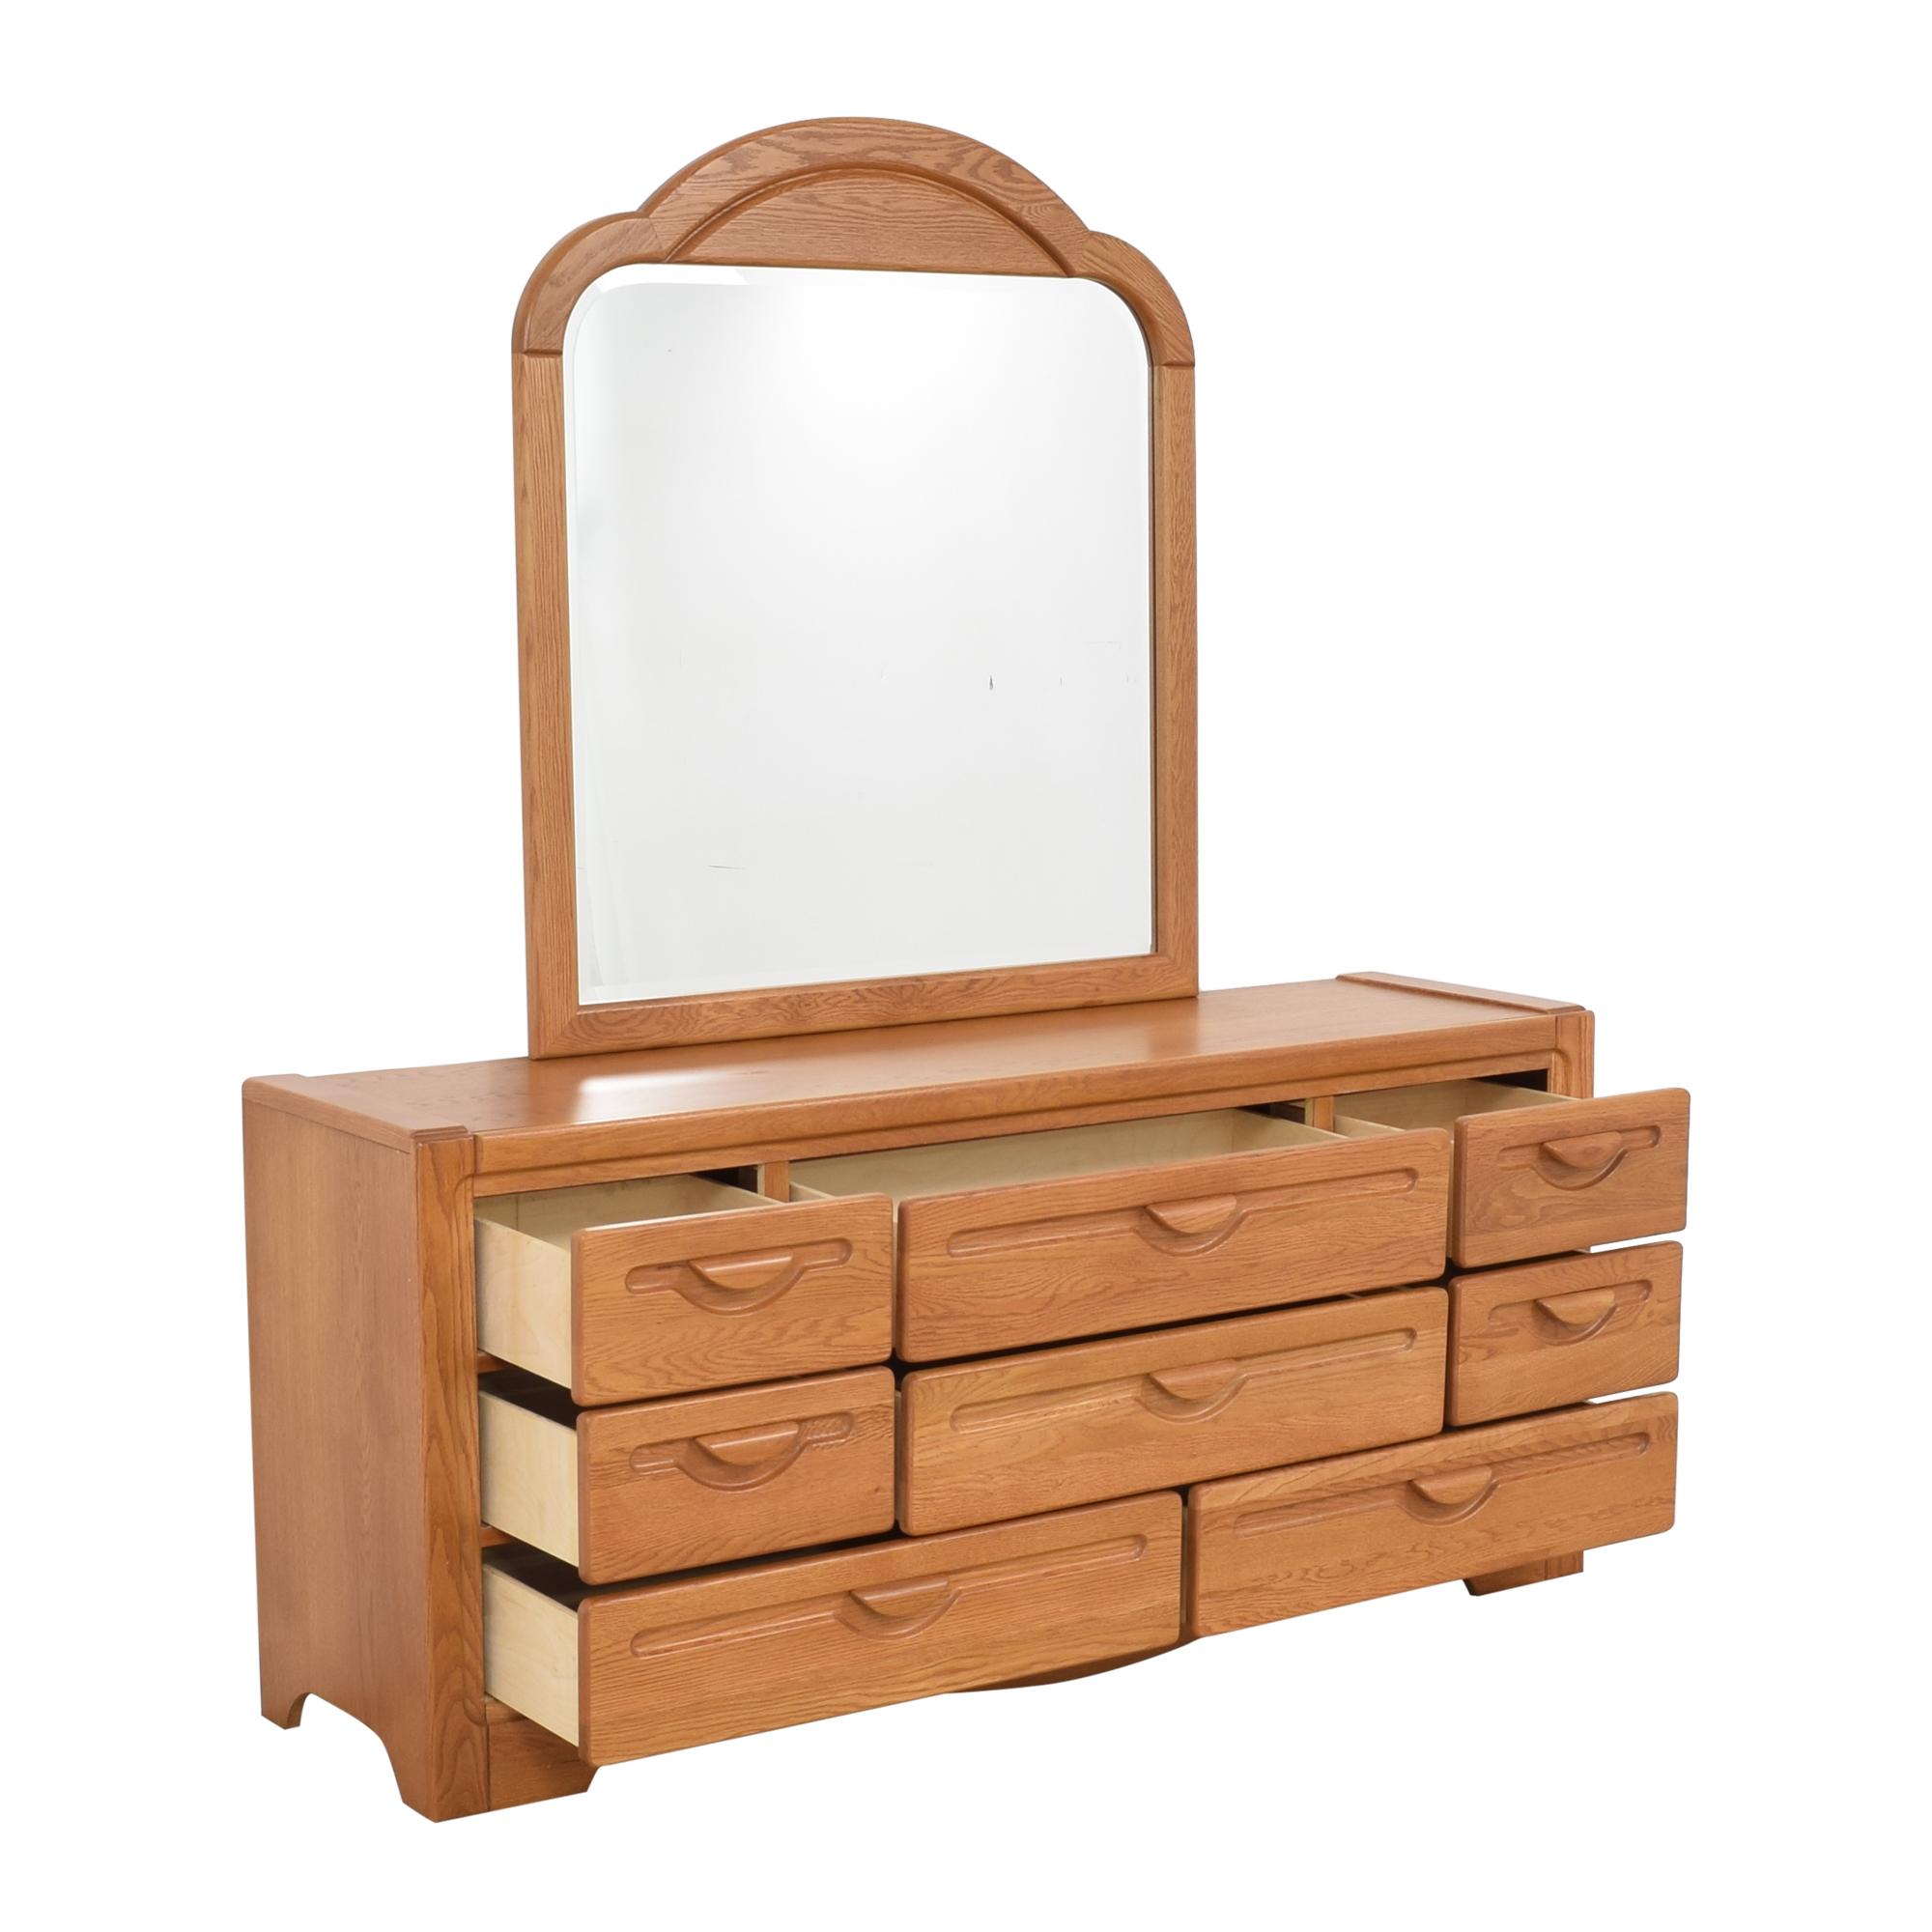 shop Webb Furniture Webb Furniture Dresser with Mirror online